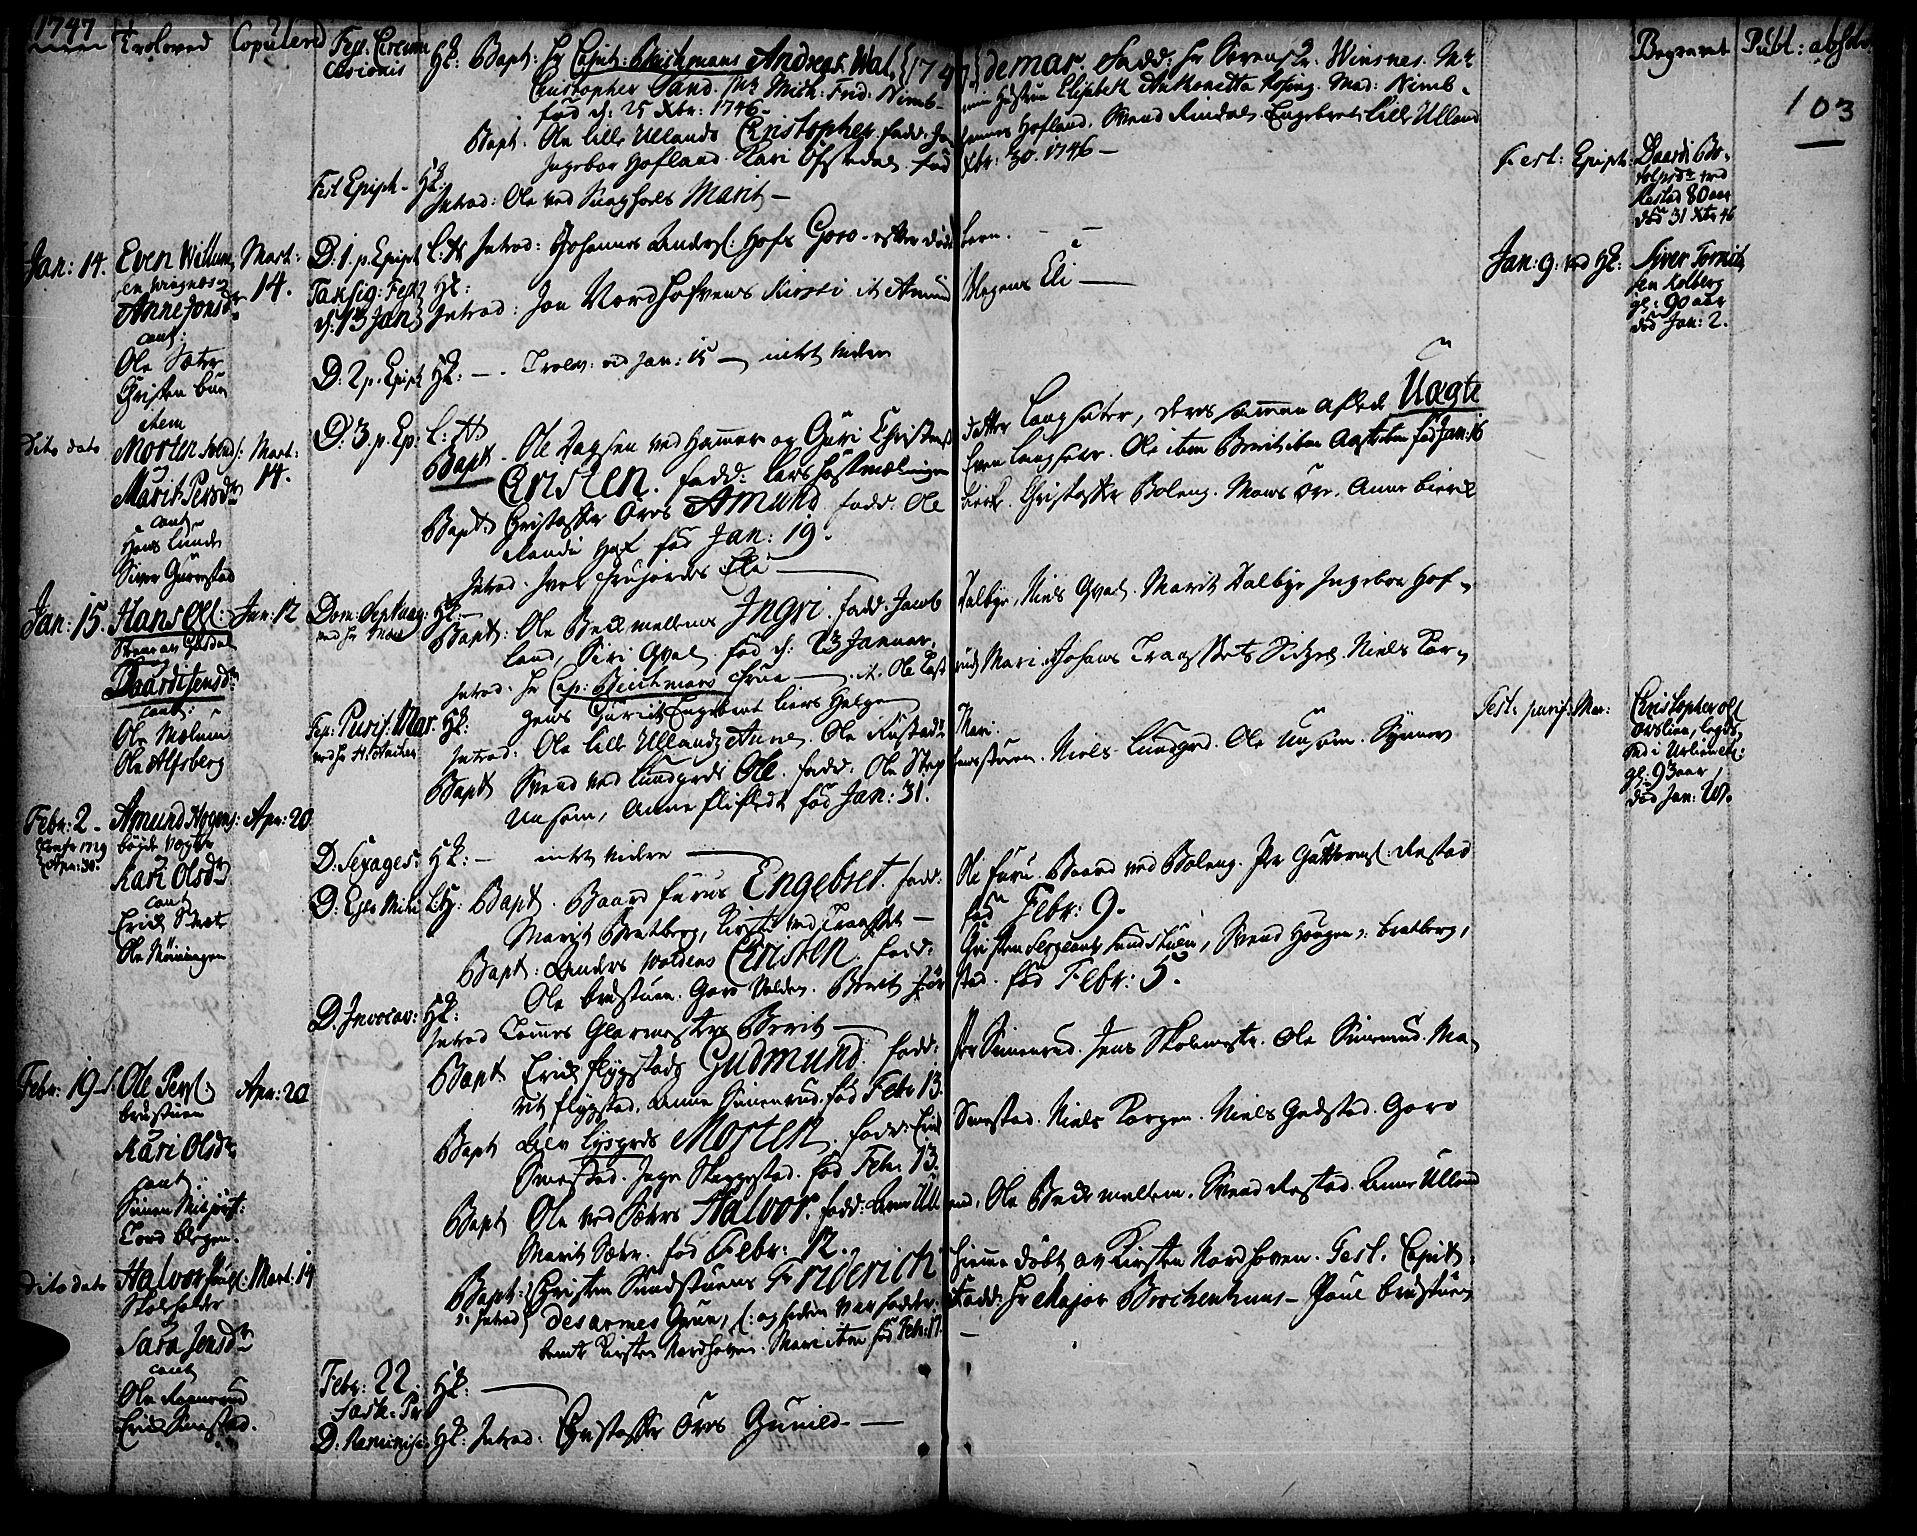 SAH, Fåberg prestekontor, Ministerialbok nr. 1, 1727-1775, s. 103